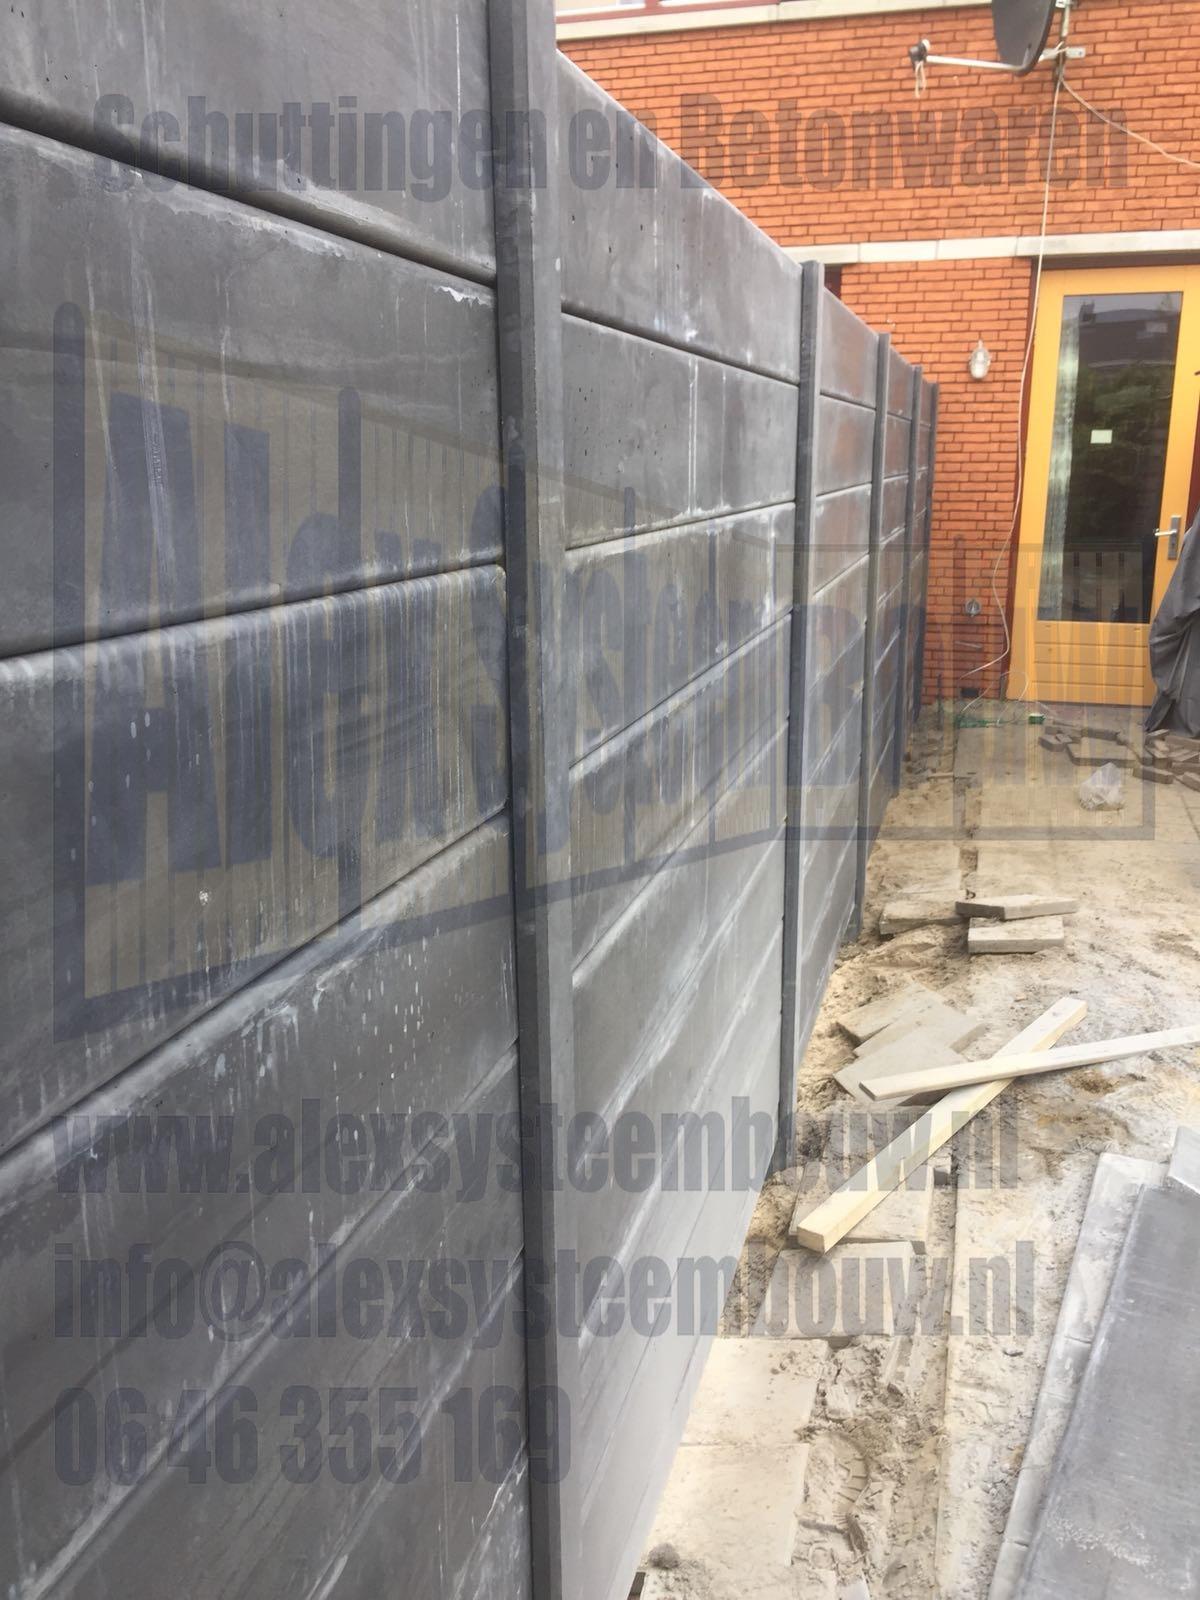 volledig-beton-schutting-met-gladde-antraciete-beton-platen